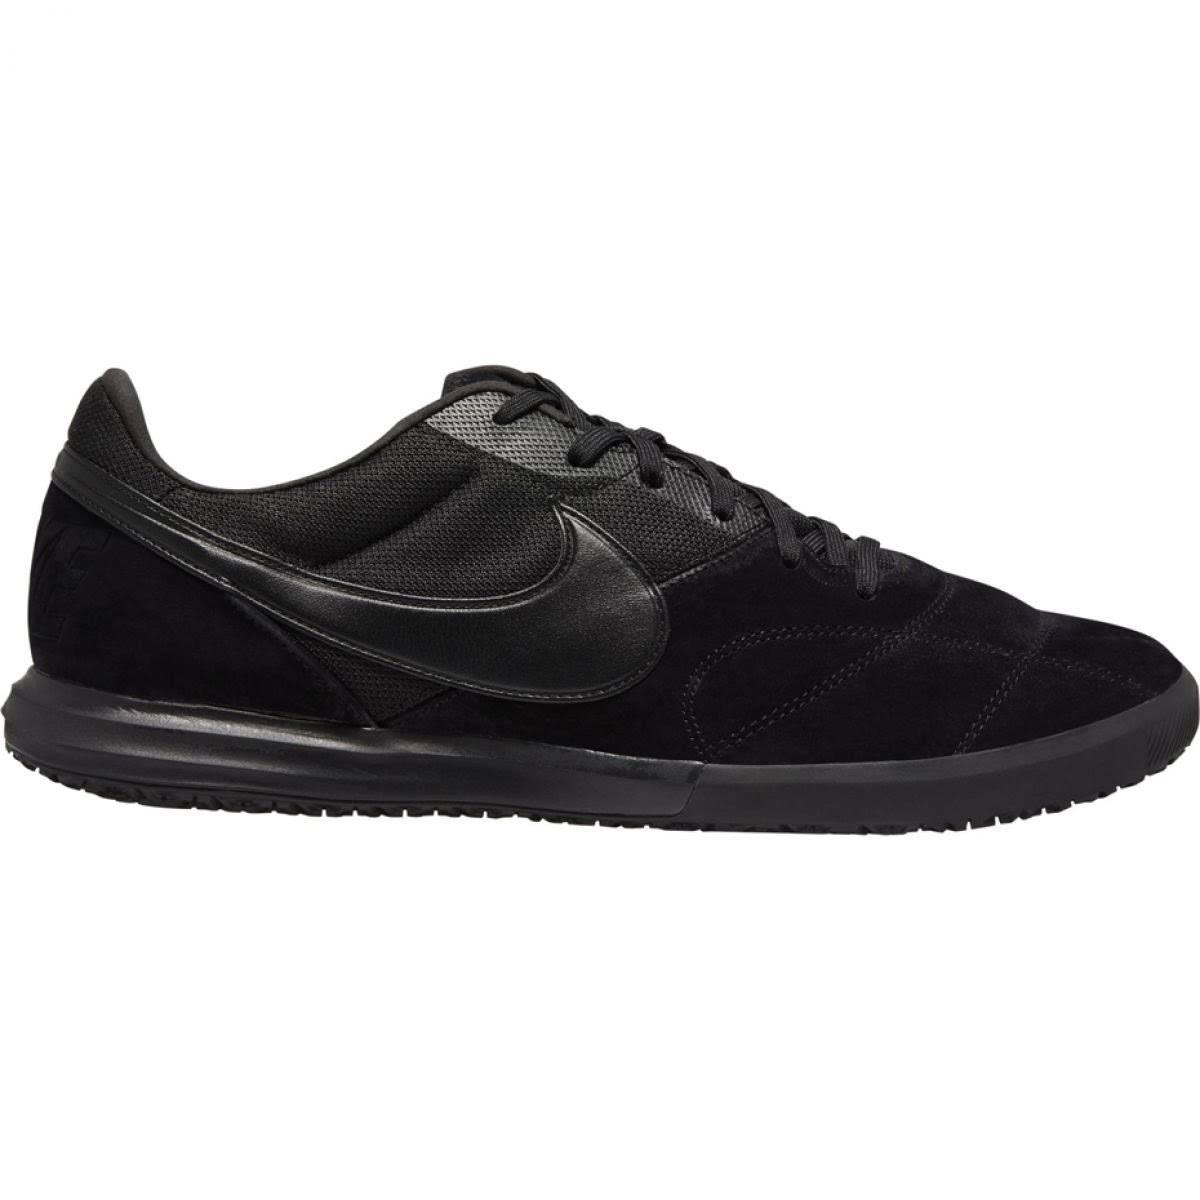 Nike Premier 2 Sala IC Indoor/Court Football Shoe - Black